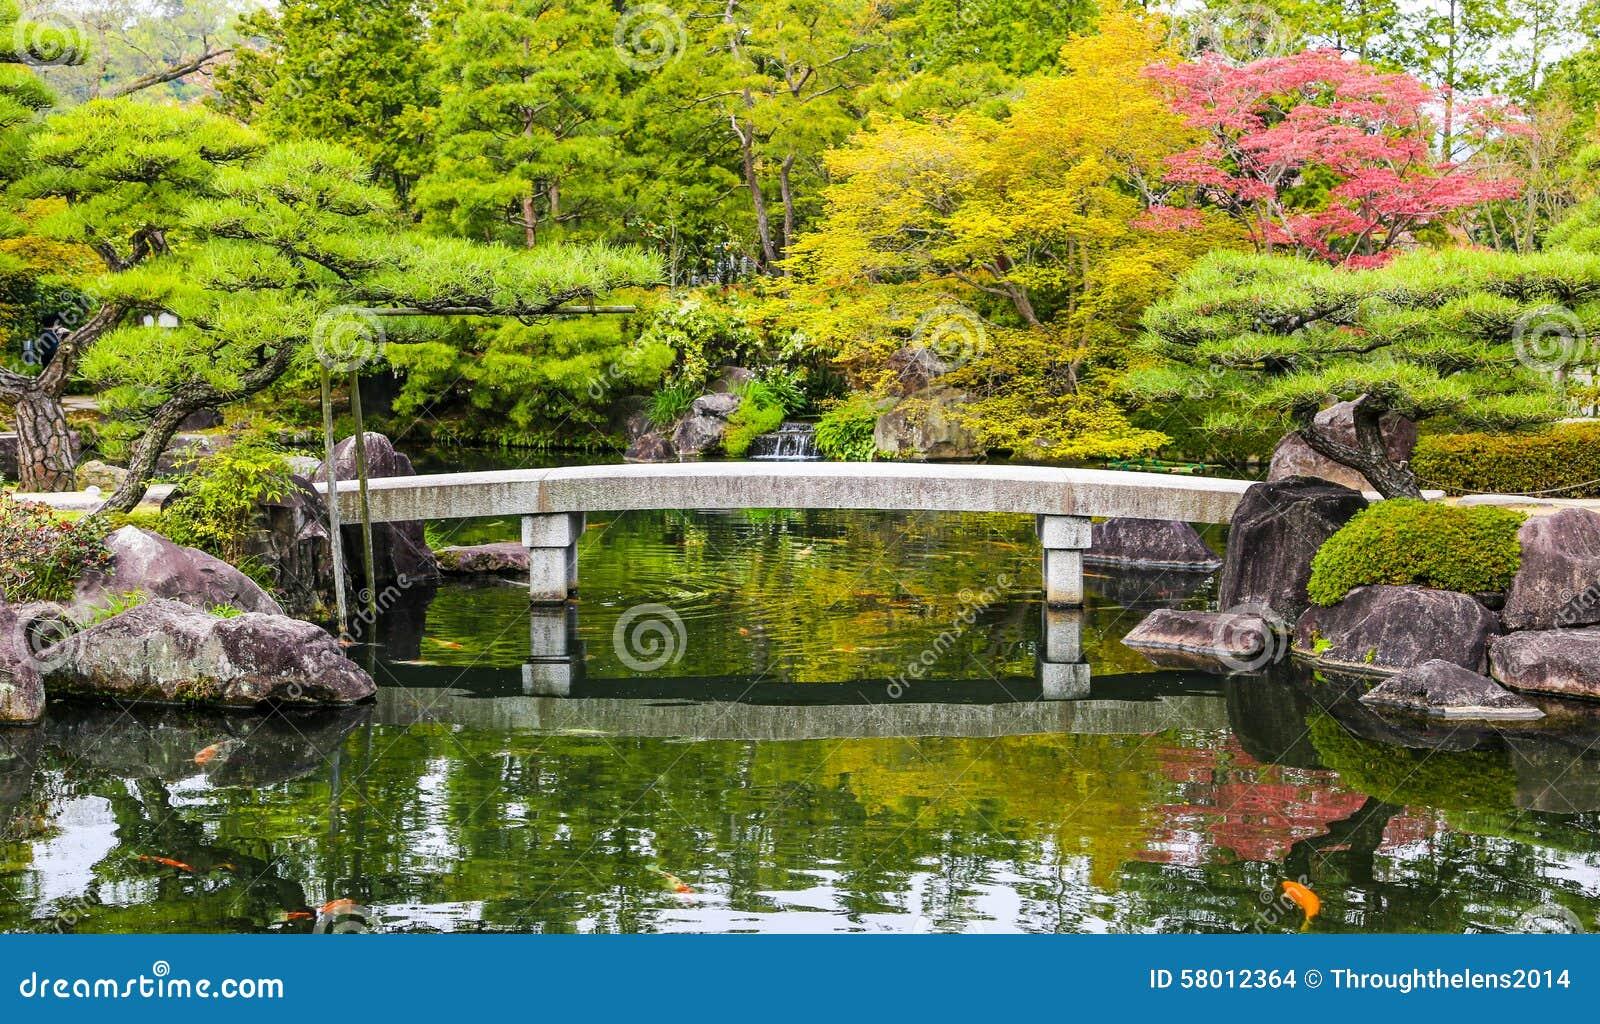 Fish pond at japanese garden stock photo cartoondealer for Pond dealers